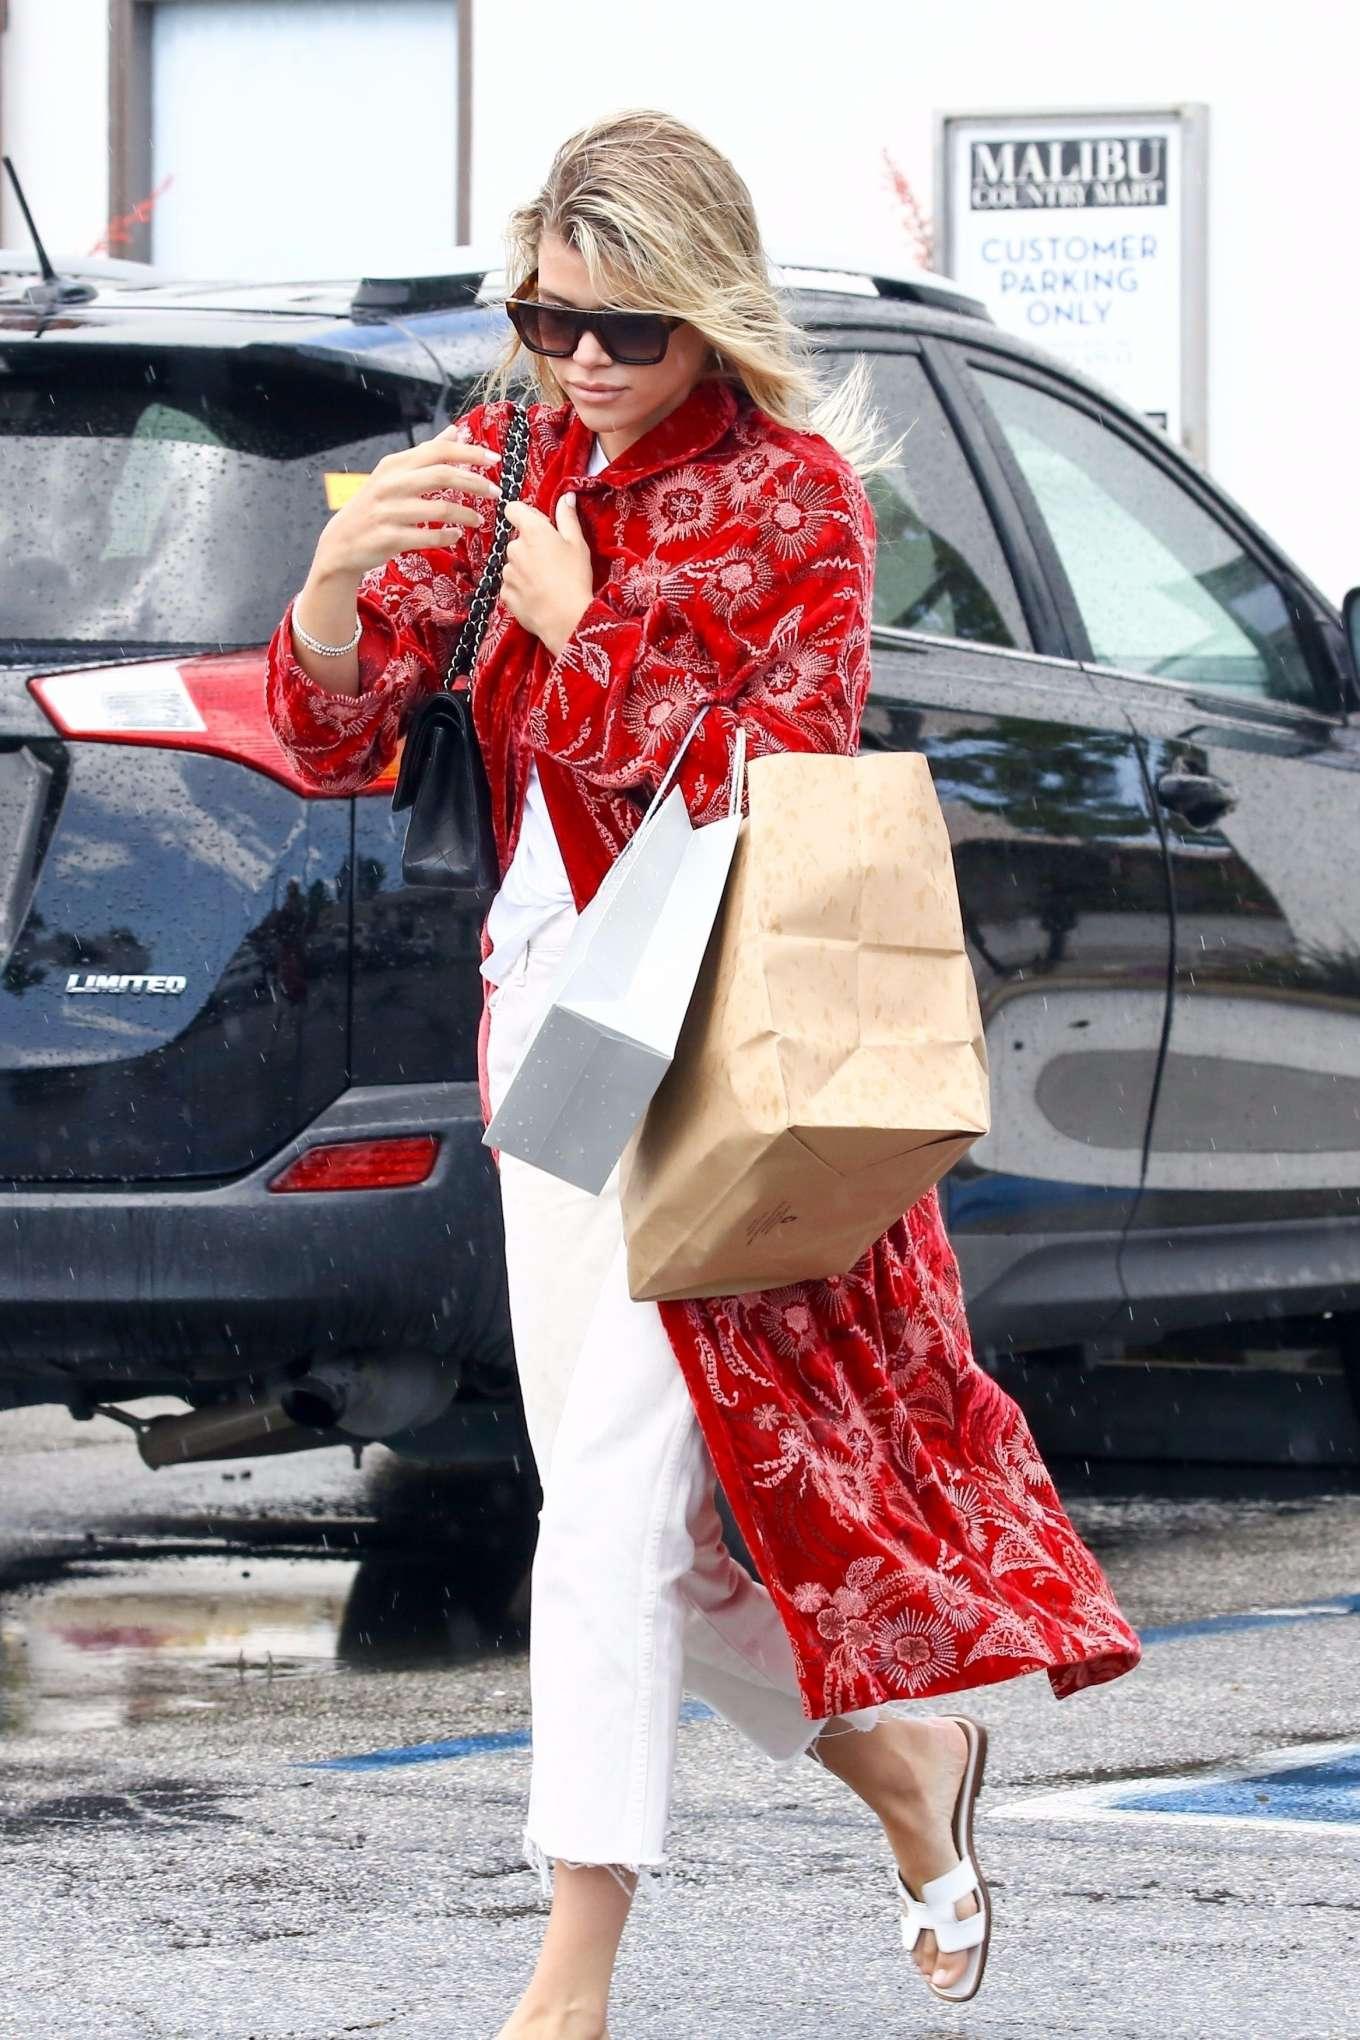 Sofia Richie - Shopping with a friend in Malibu